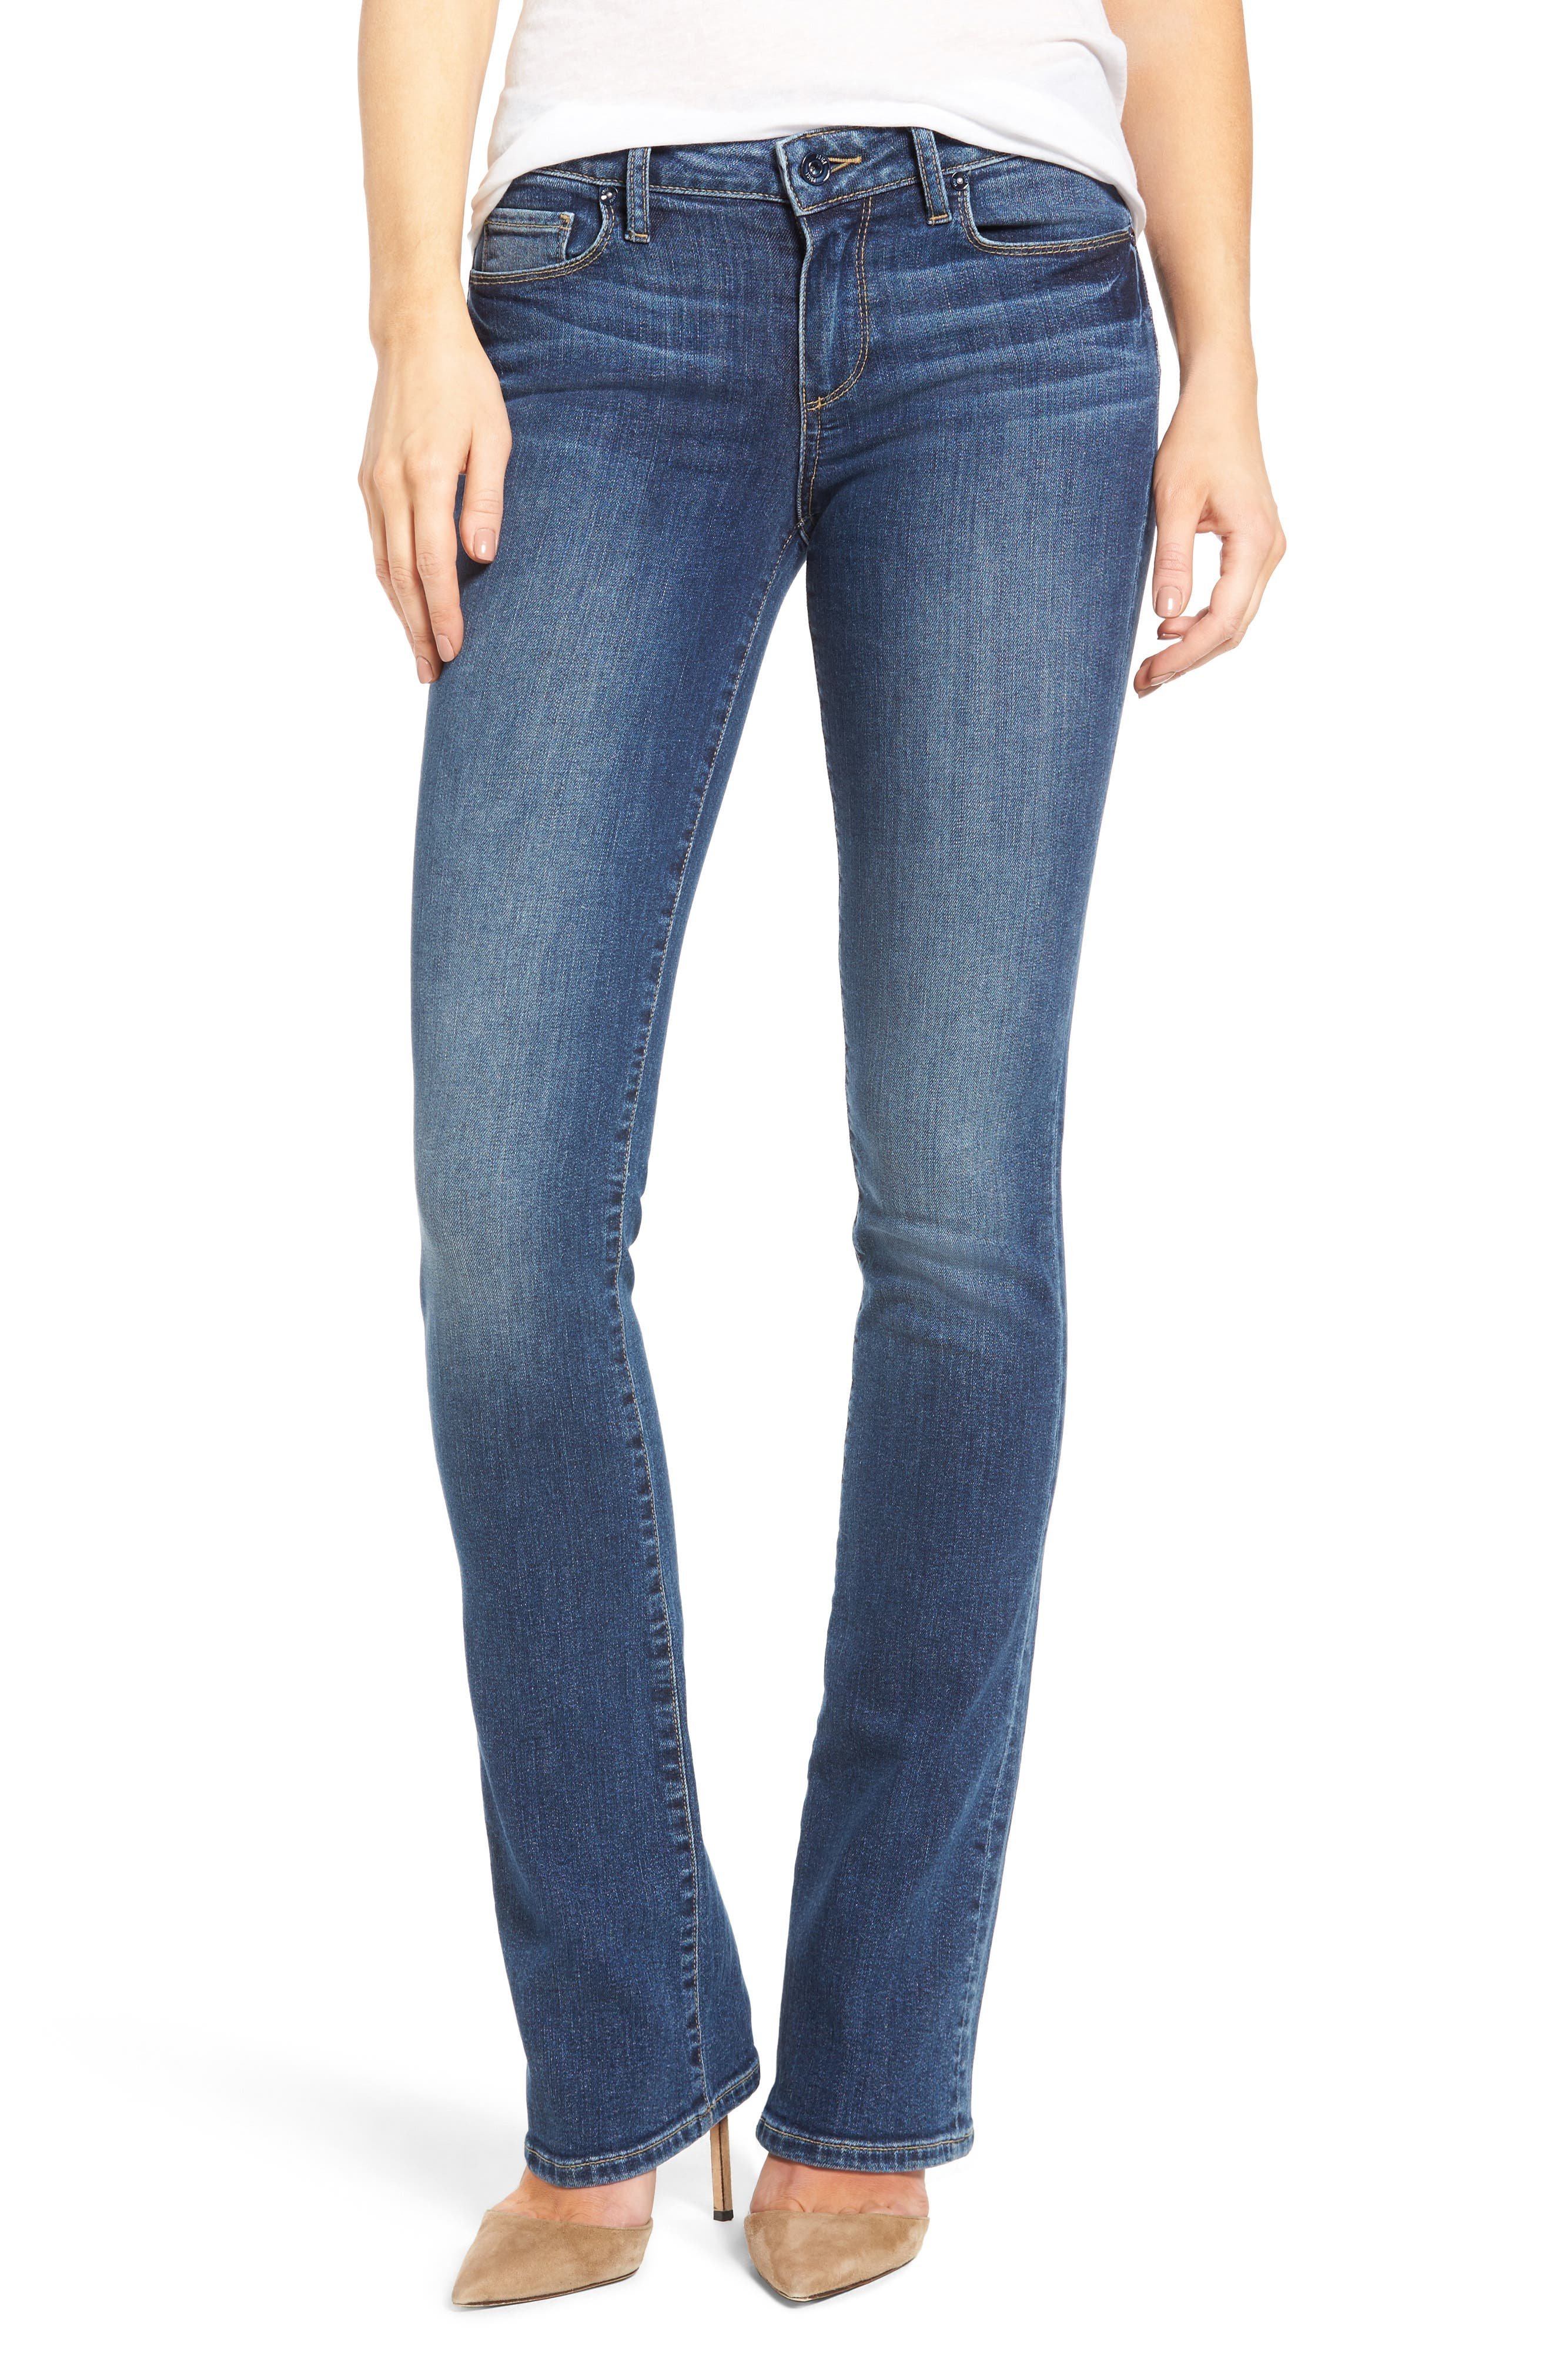 Alternate Image 1 Selected - PAIGE Transcend - Manhattan Bootcut Jeans (Lane)